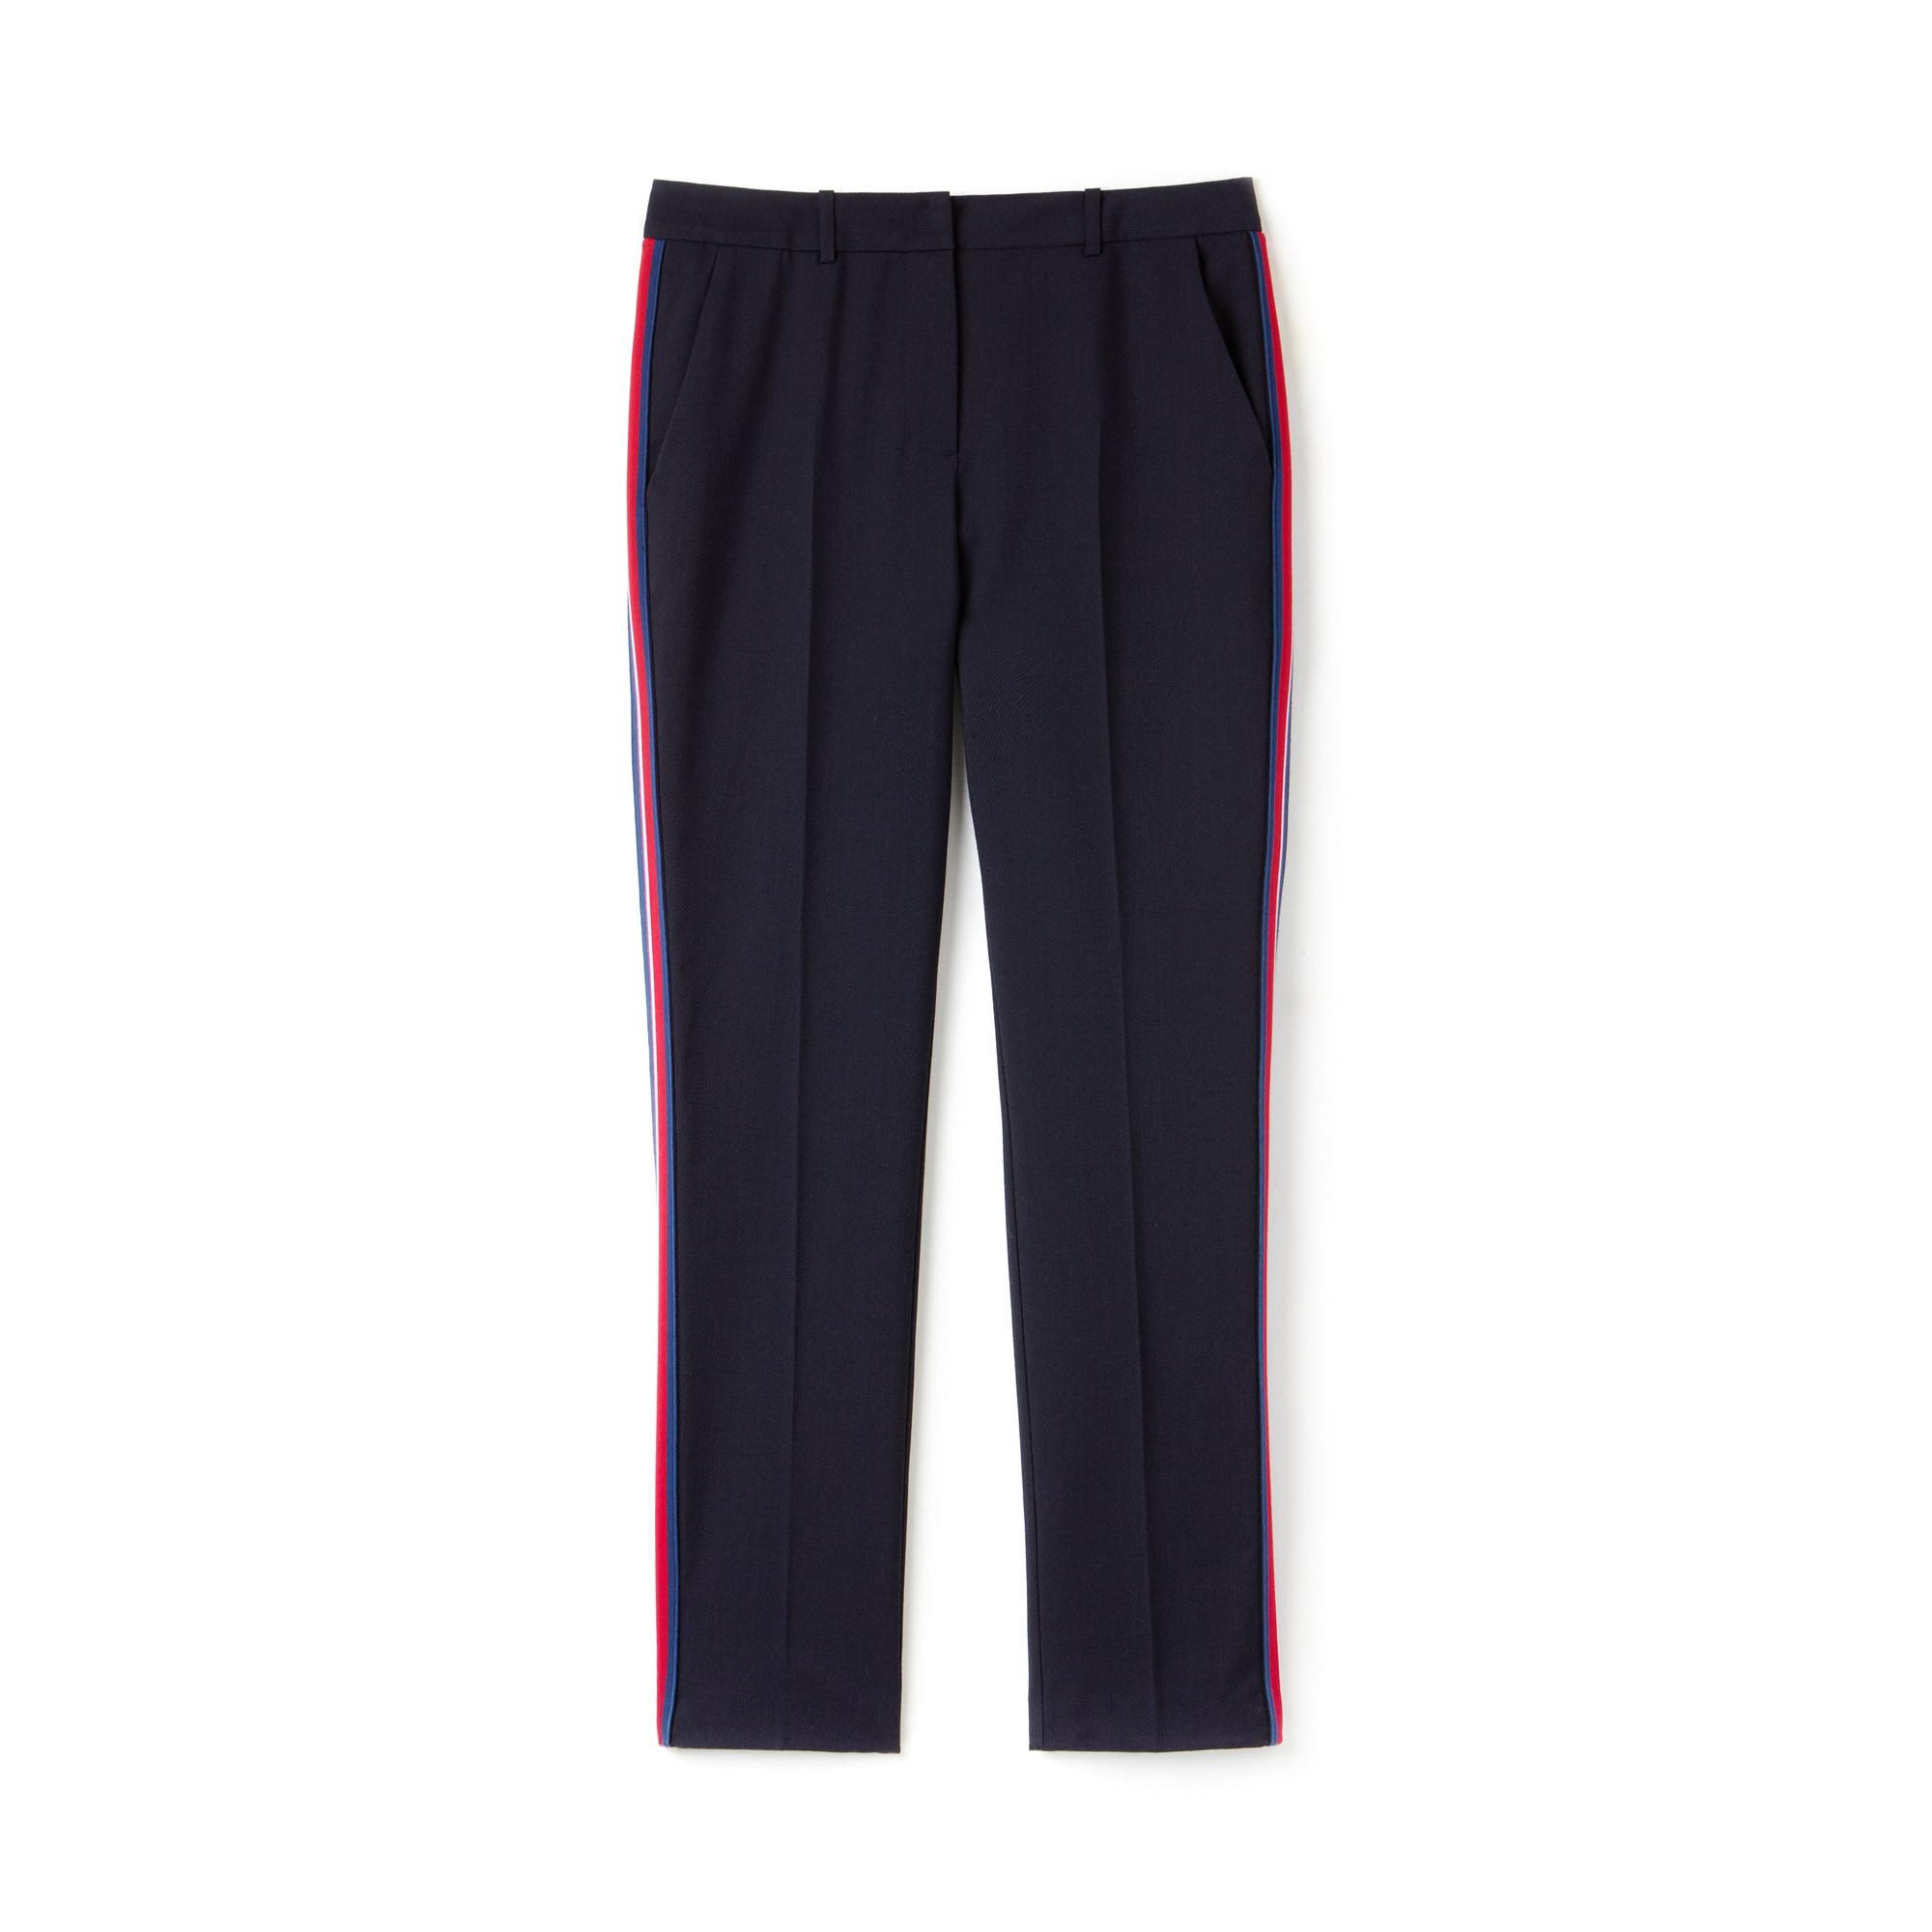 Women's Slim Fit Side Bands Stretch Wool Piqué